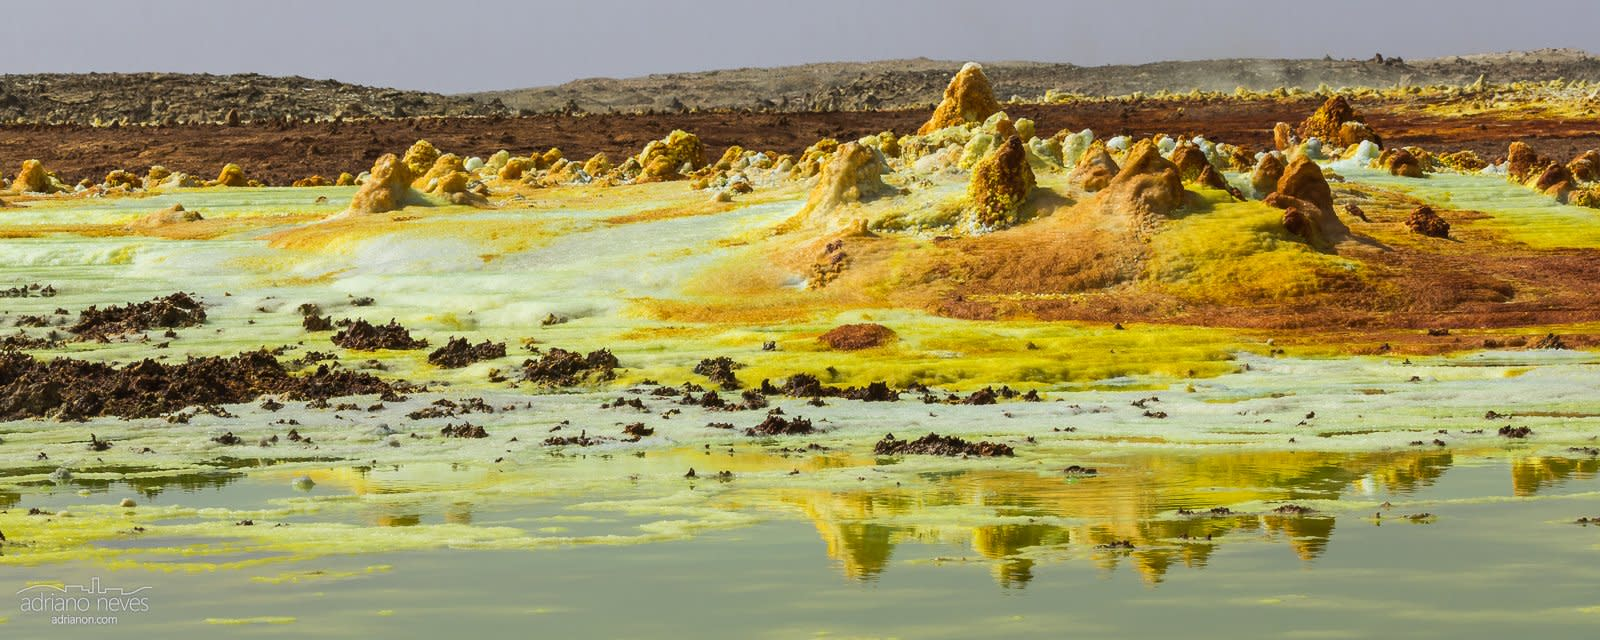 Dallol - Ethiopia, Afar